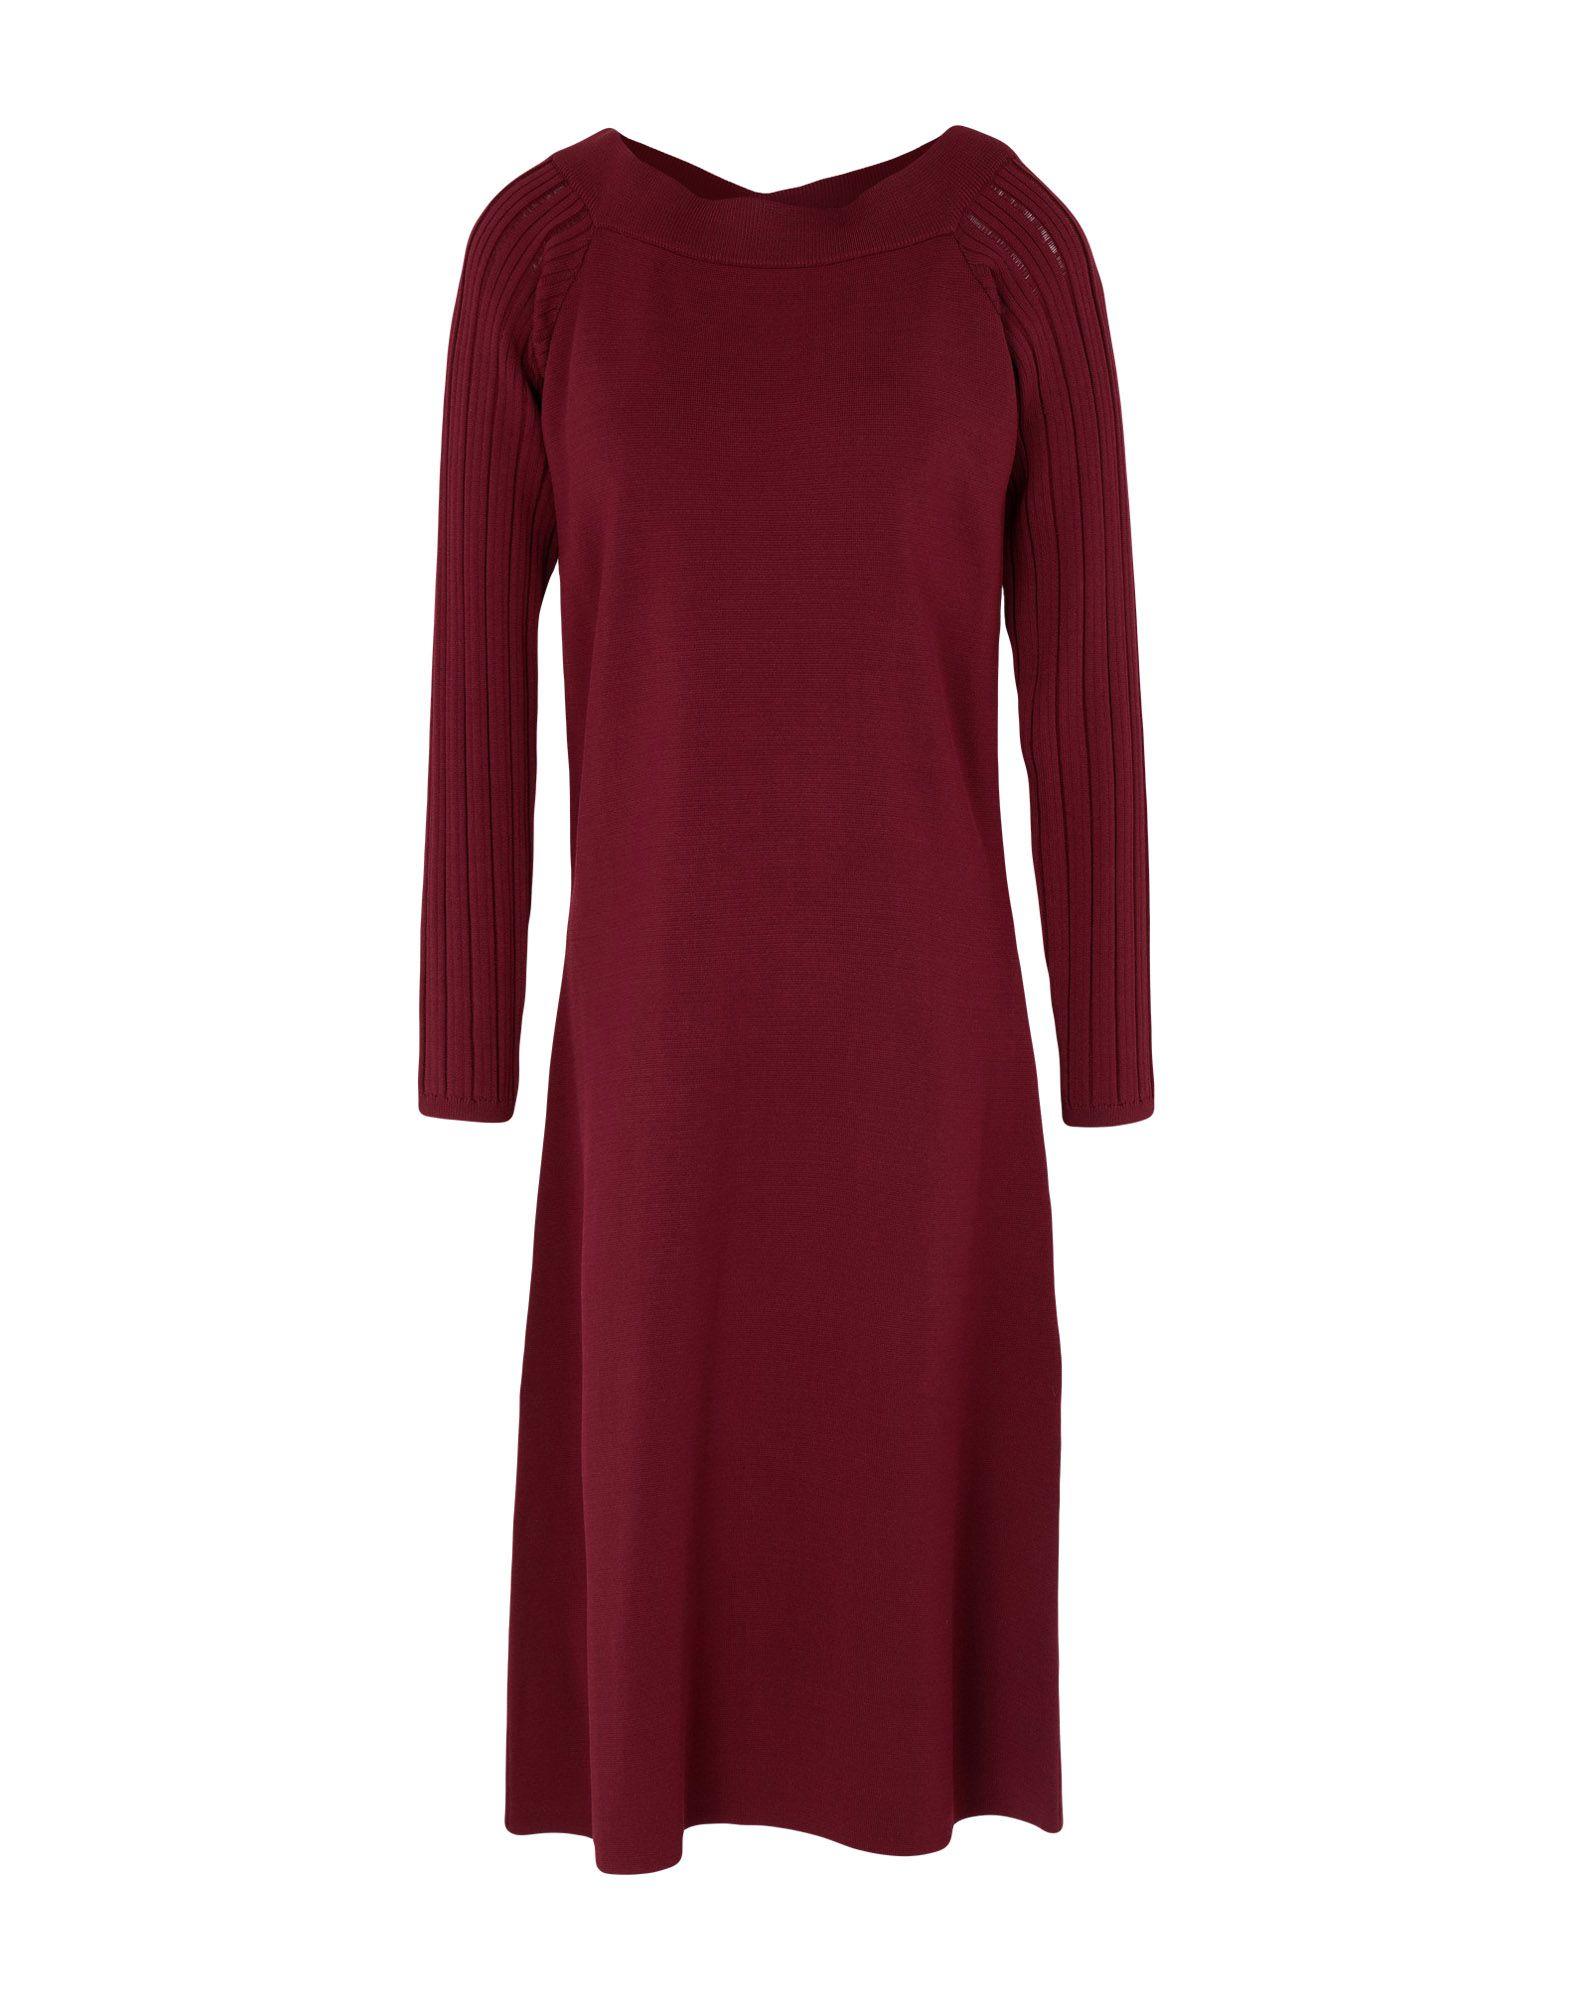 купить CHARLI Платье до колена по цене 2400 рублей